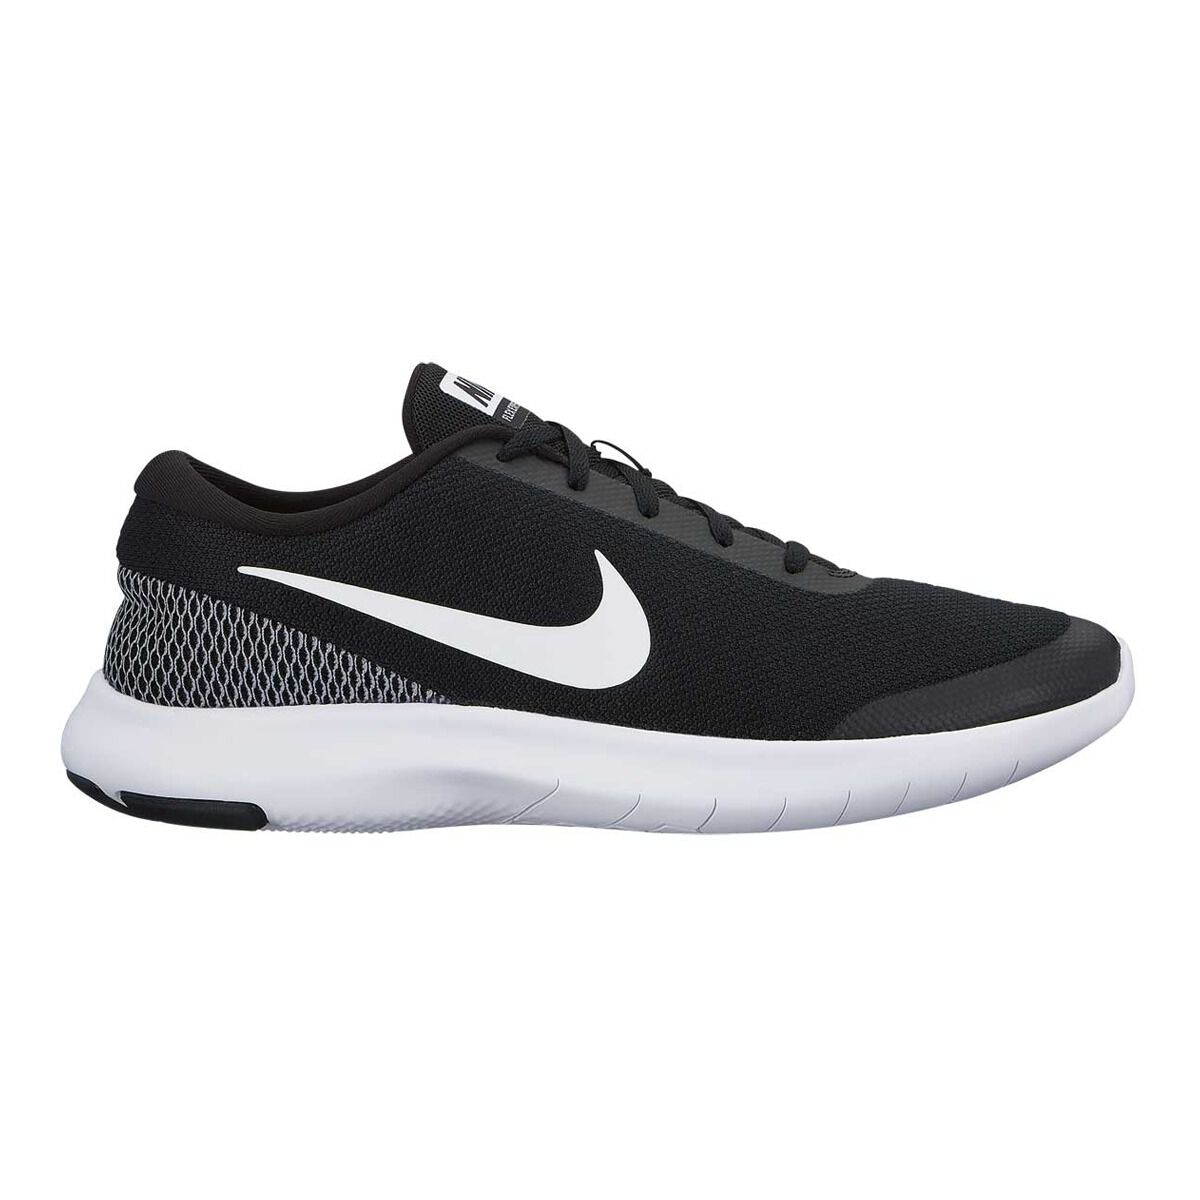 nike flex running shoes mens